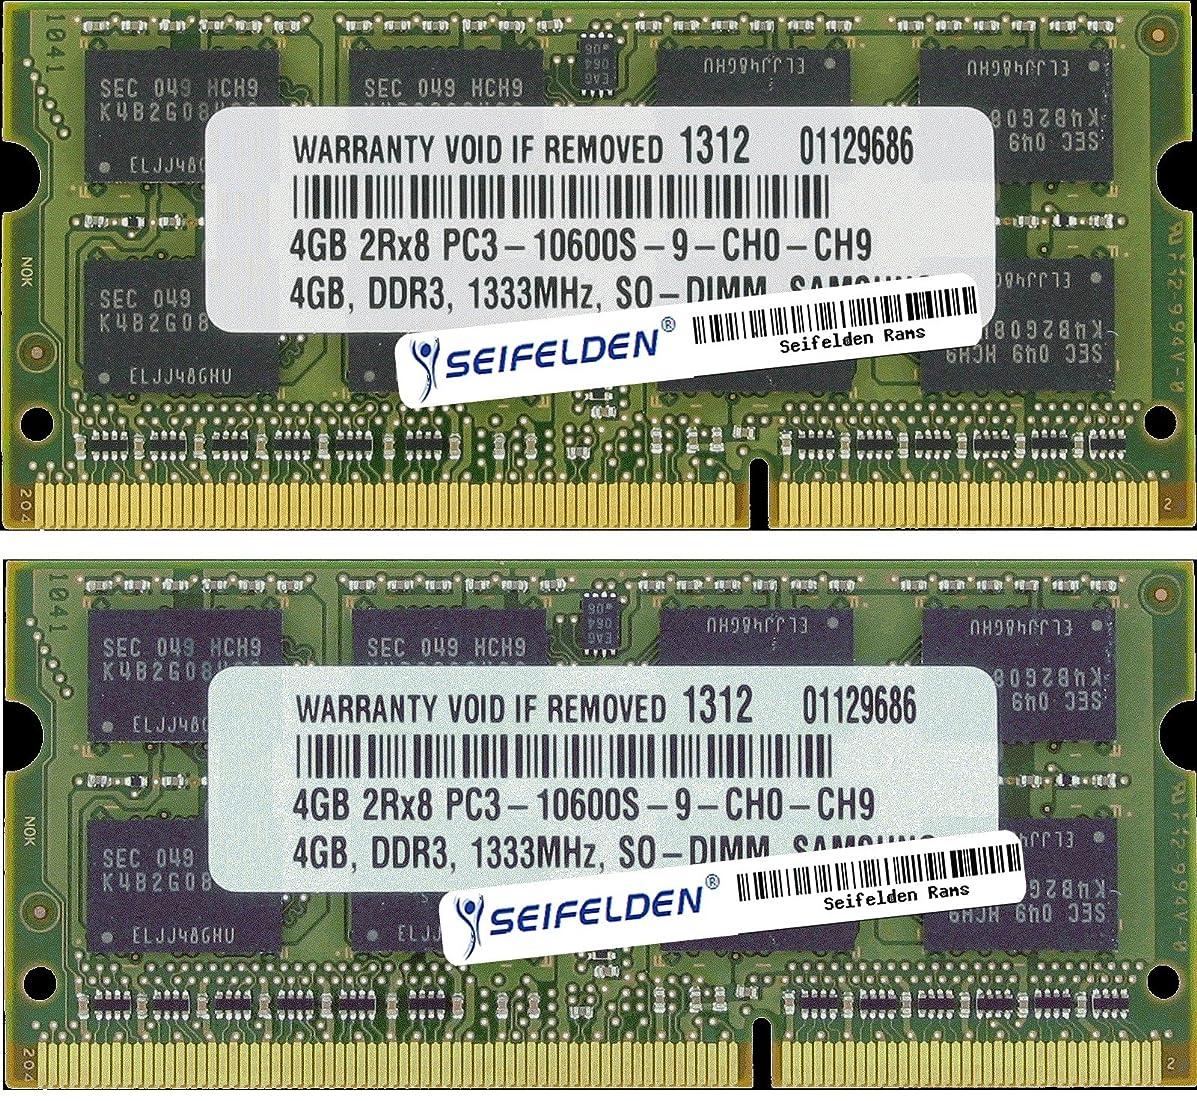 8GB (2X4GB) Memory RAM for Compaq Presario CQ62 - Laptop Memory Upgrade - Limited